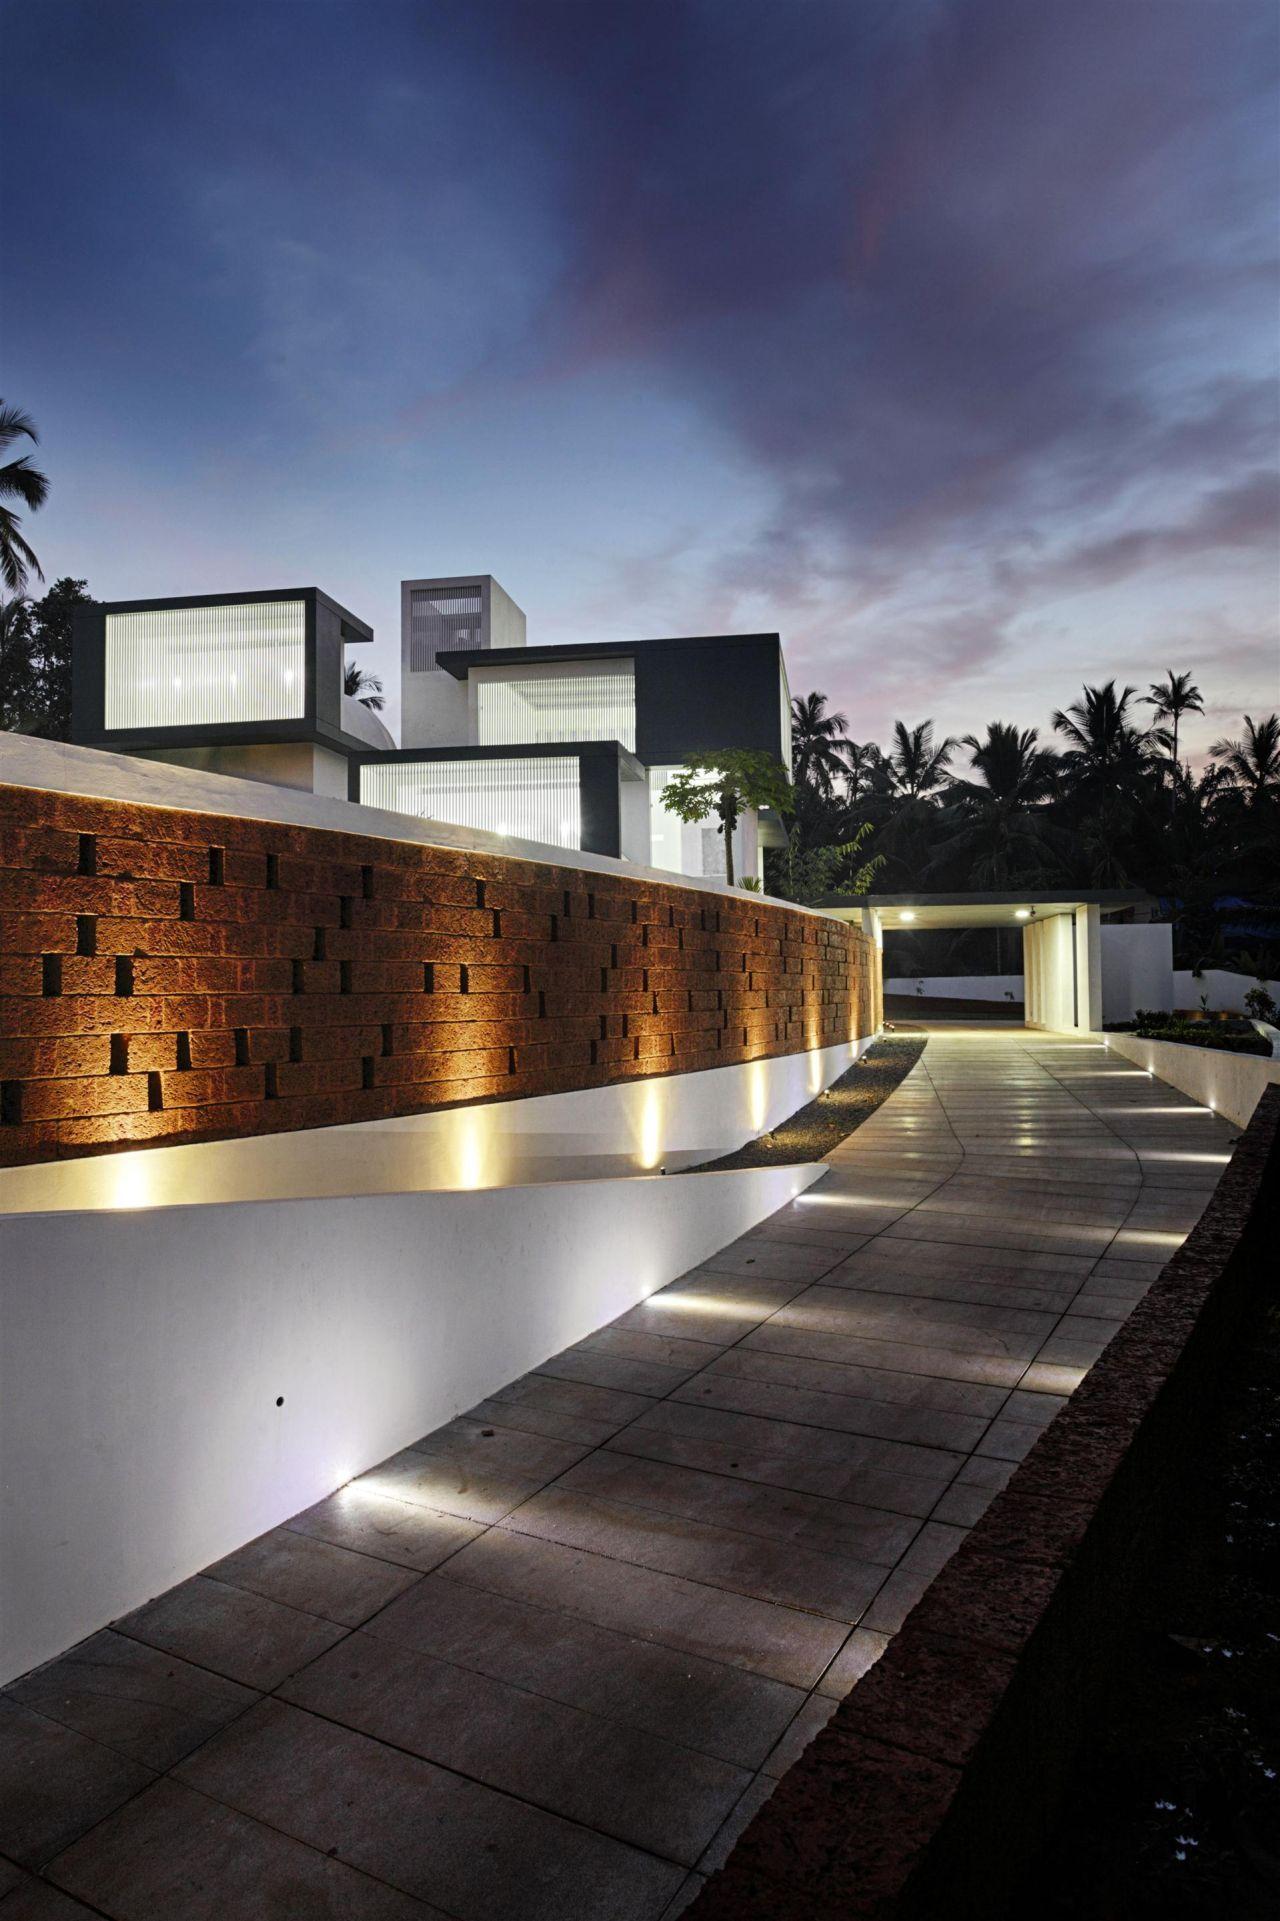 Wall Art Ideas Modern Driveway Driveway Design Architecture